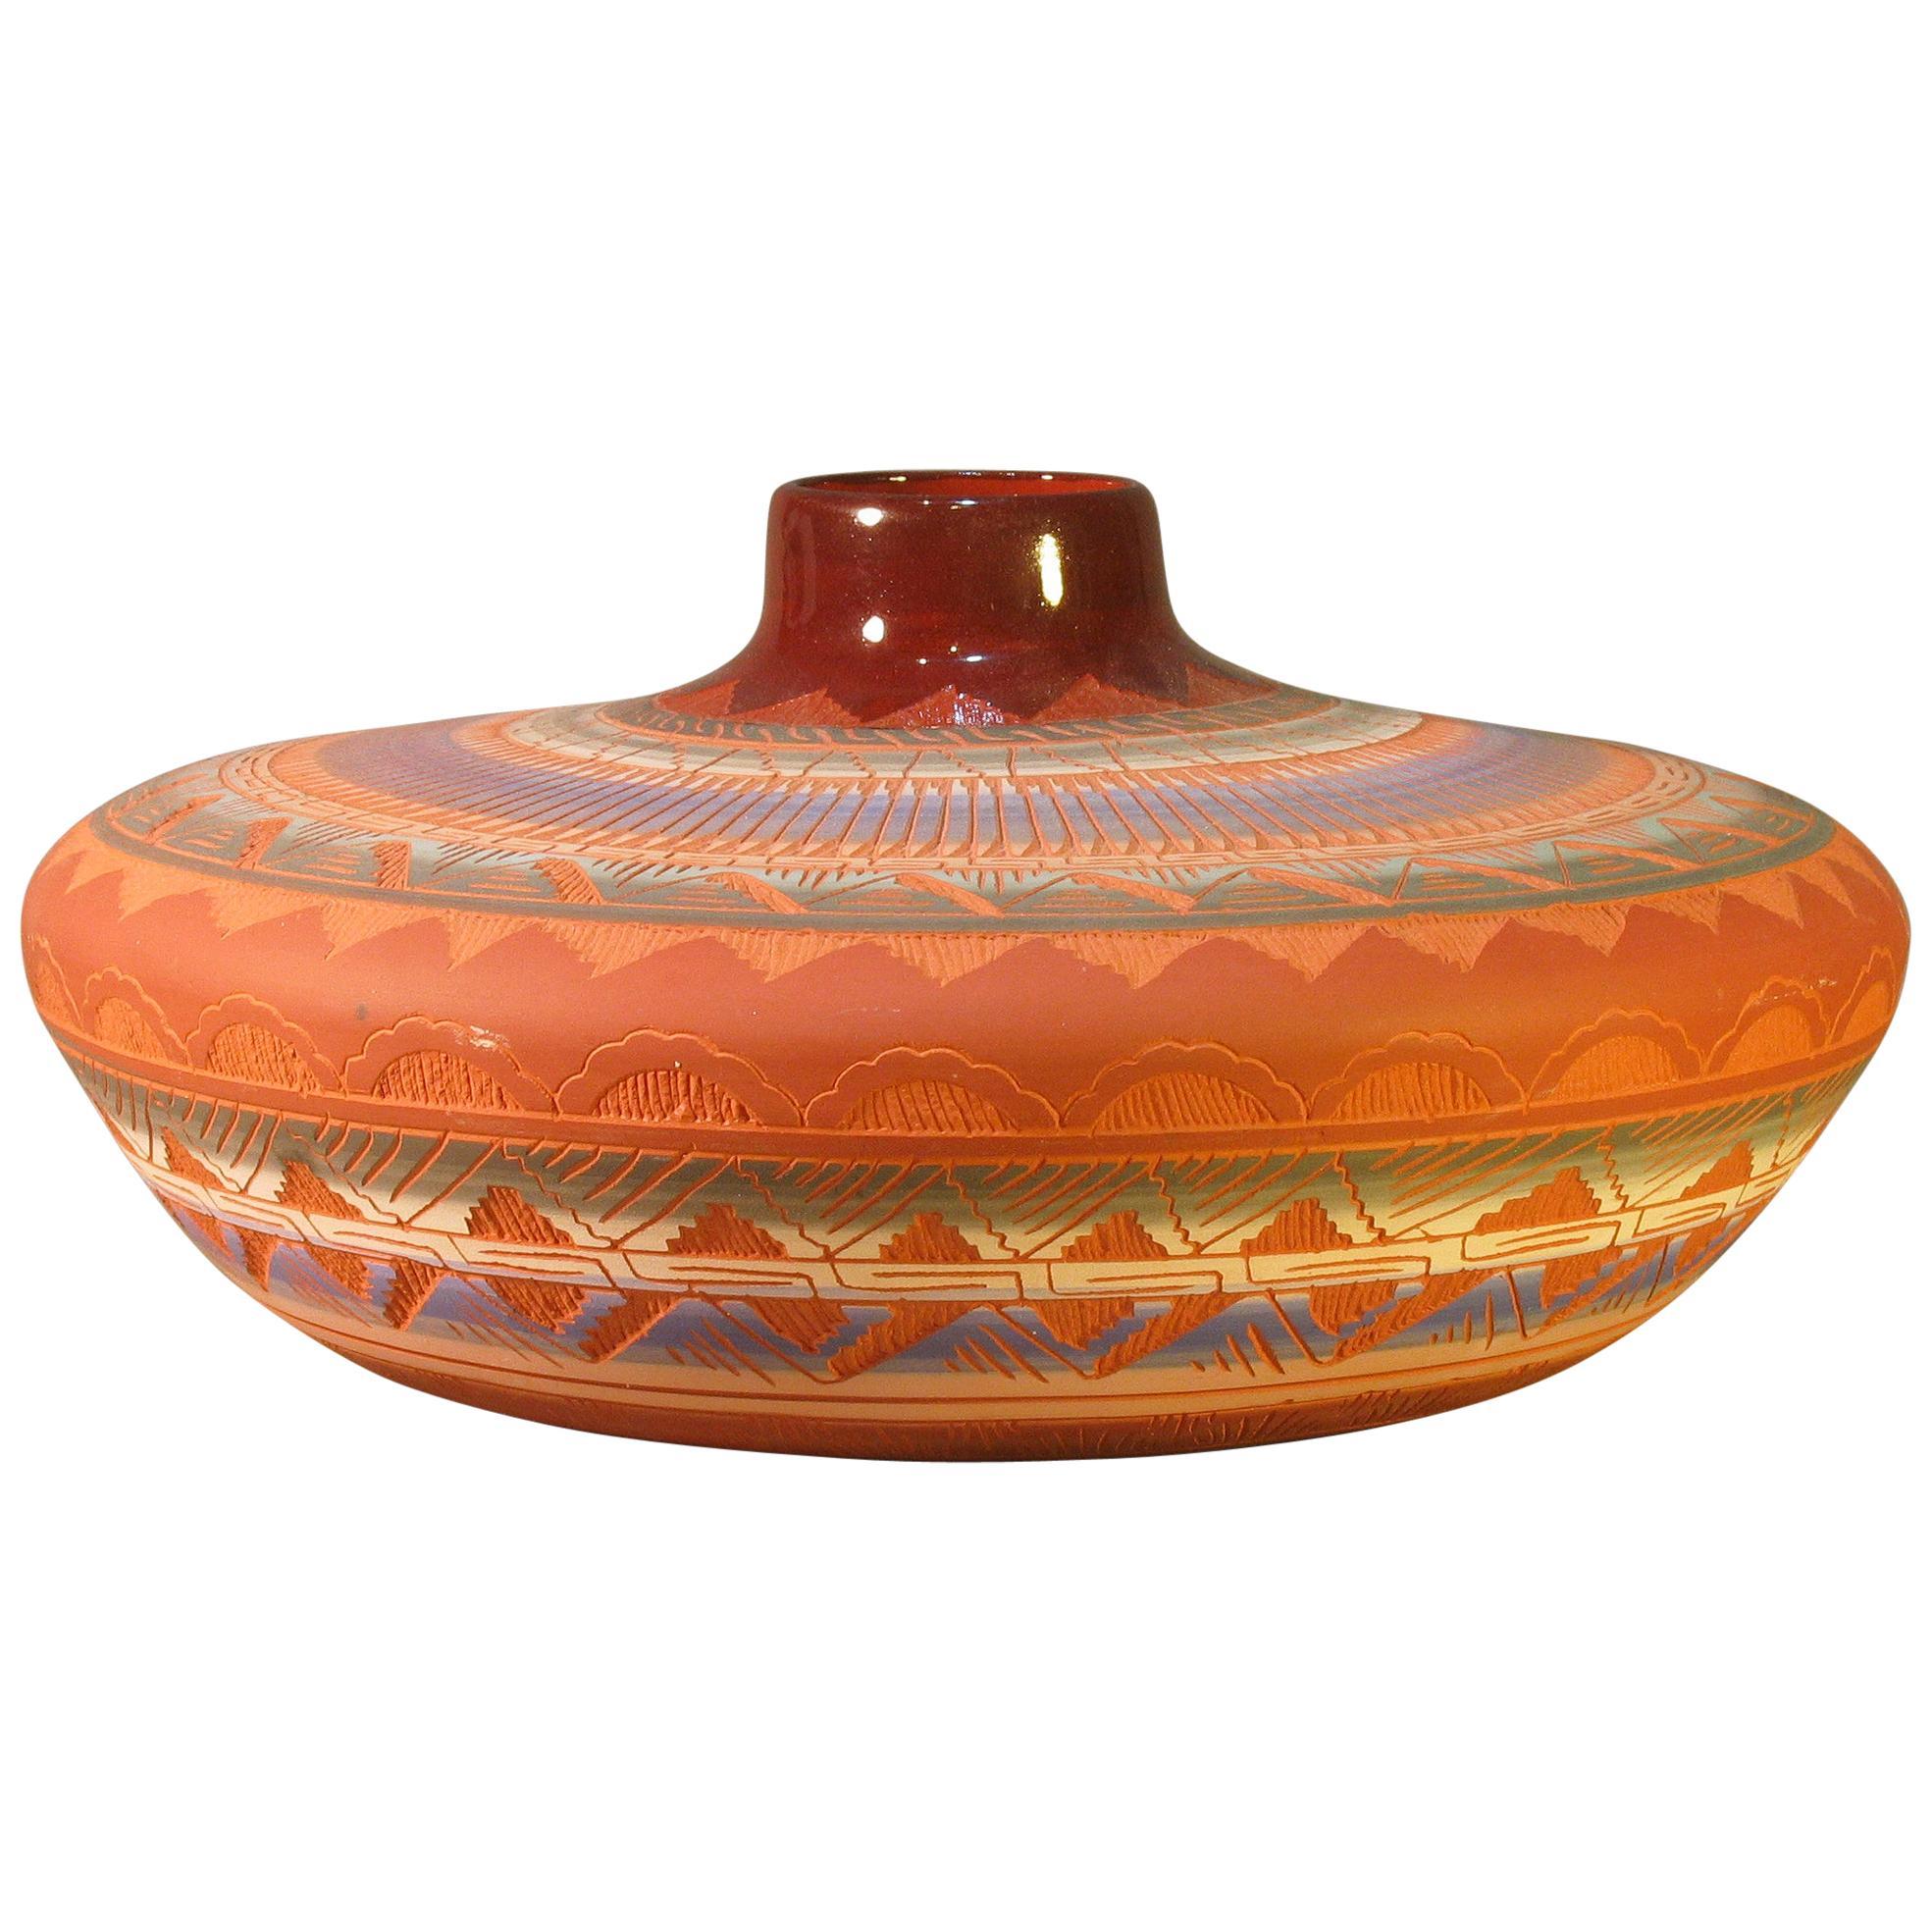 Large Navaho Pottery Jar, 20th Century